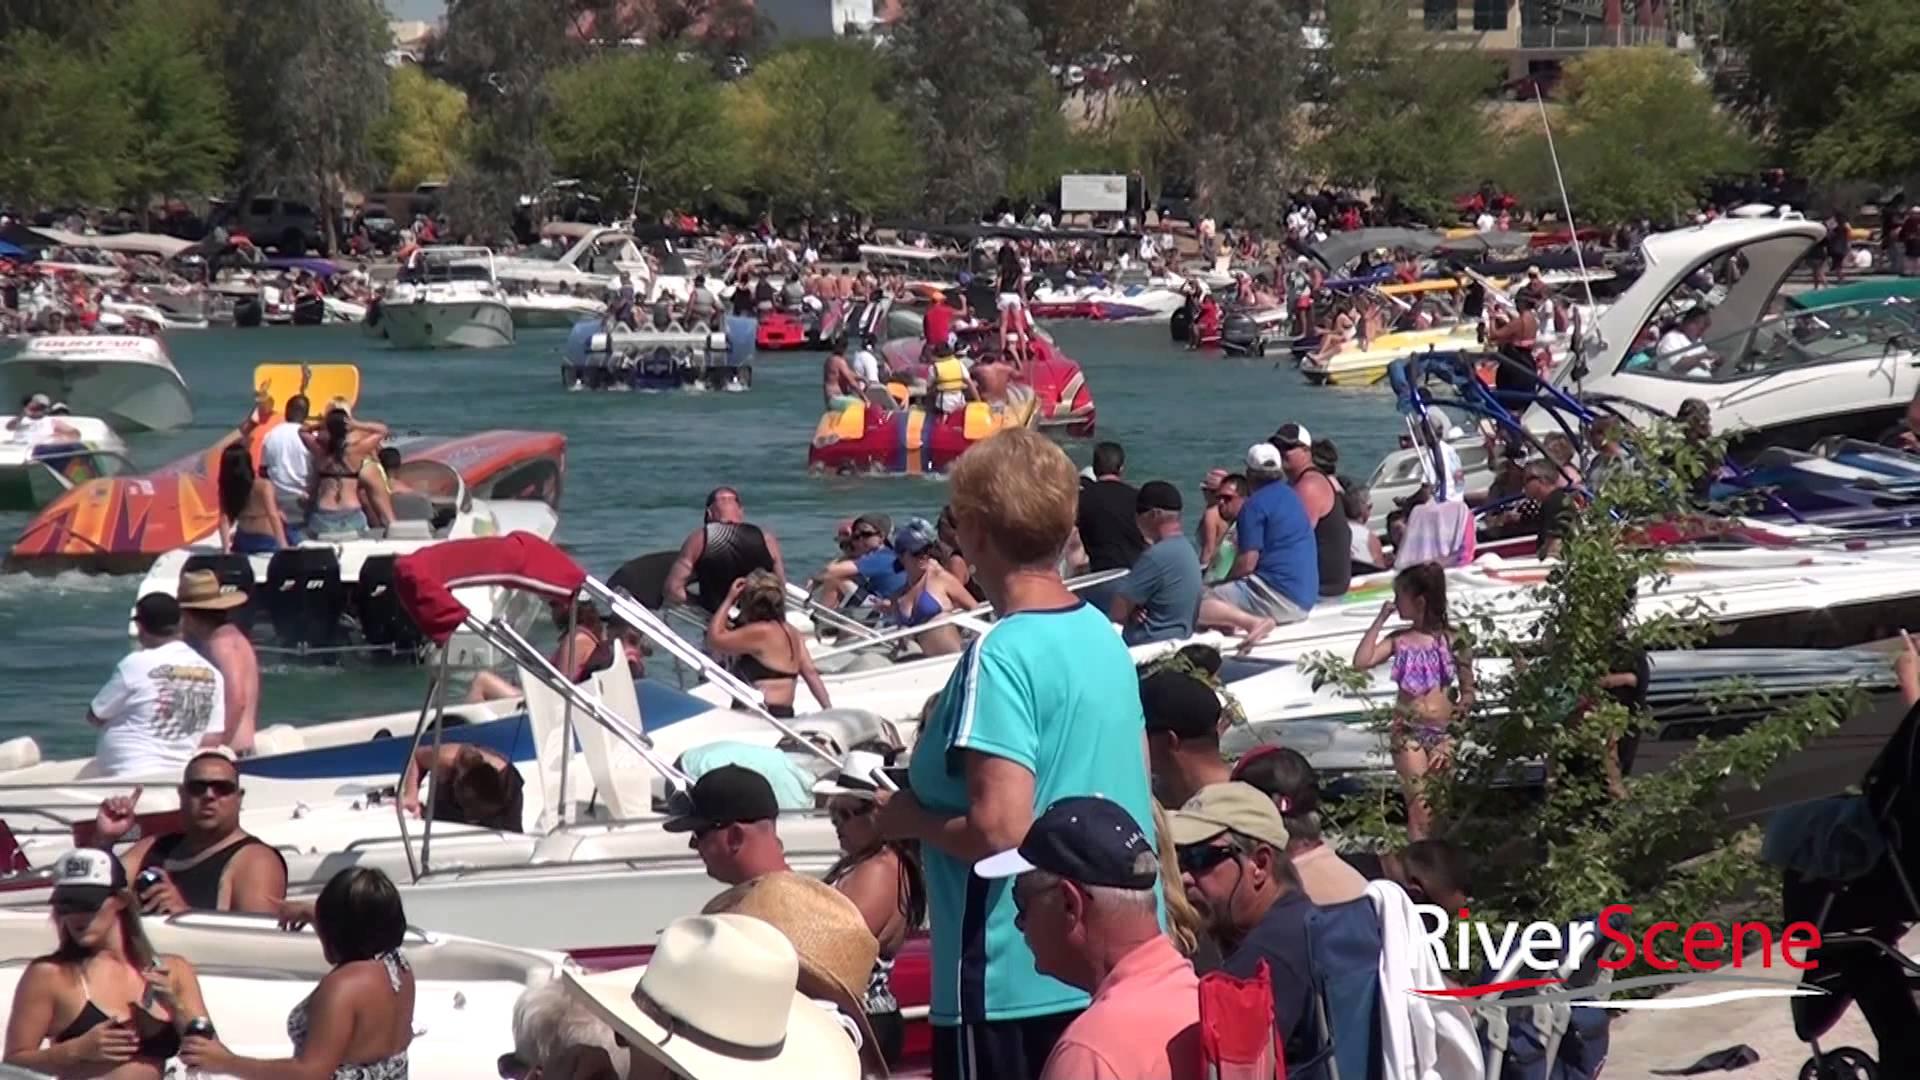 Desert Storm Video Boat Parade and Poker Run (Friday)